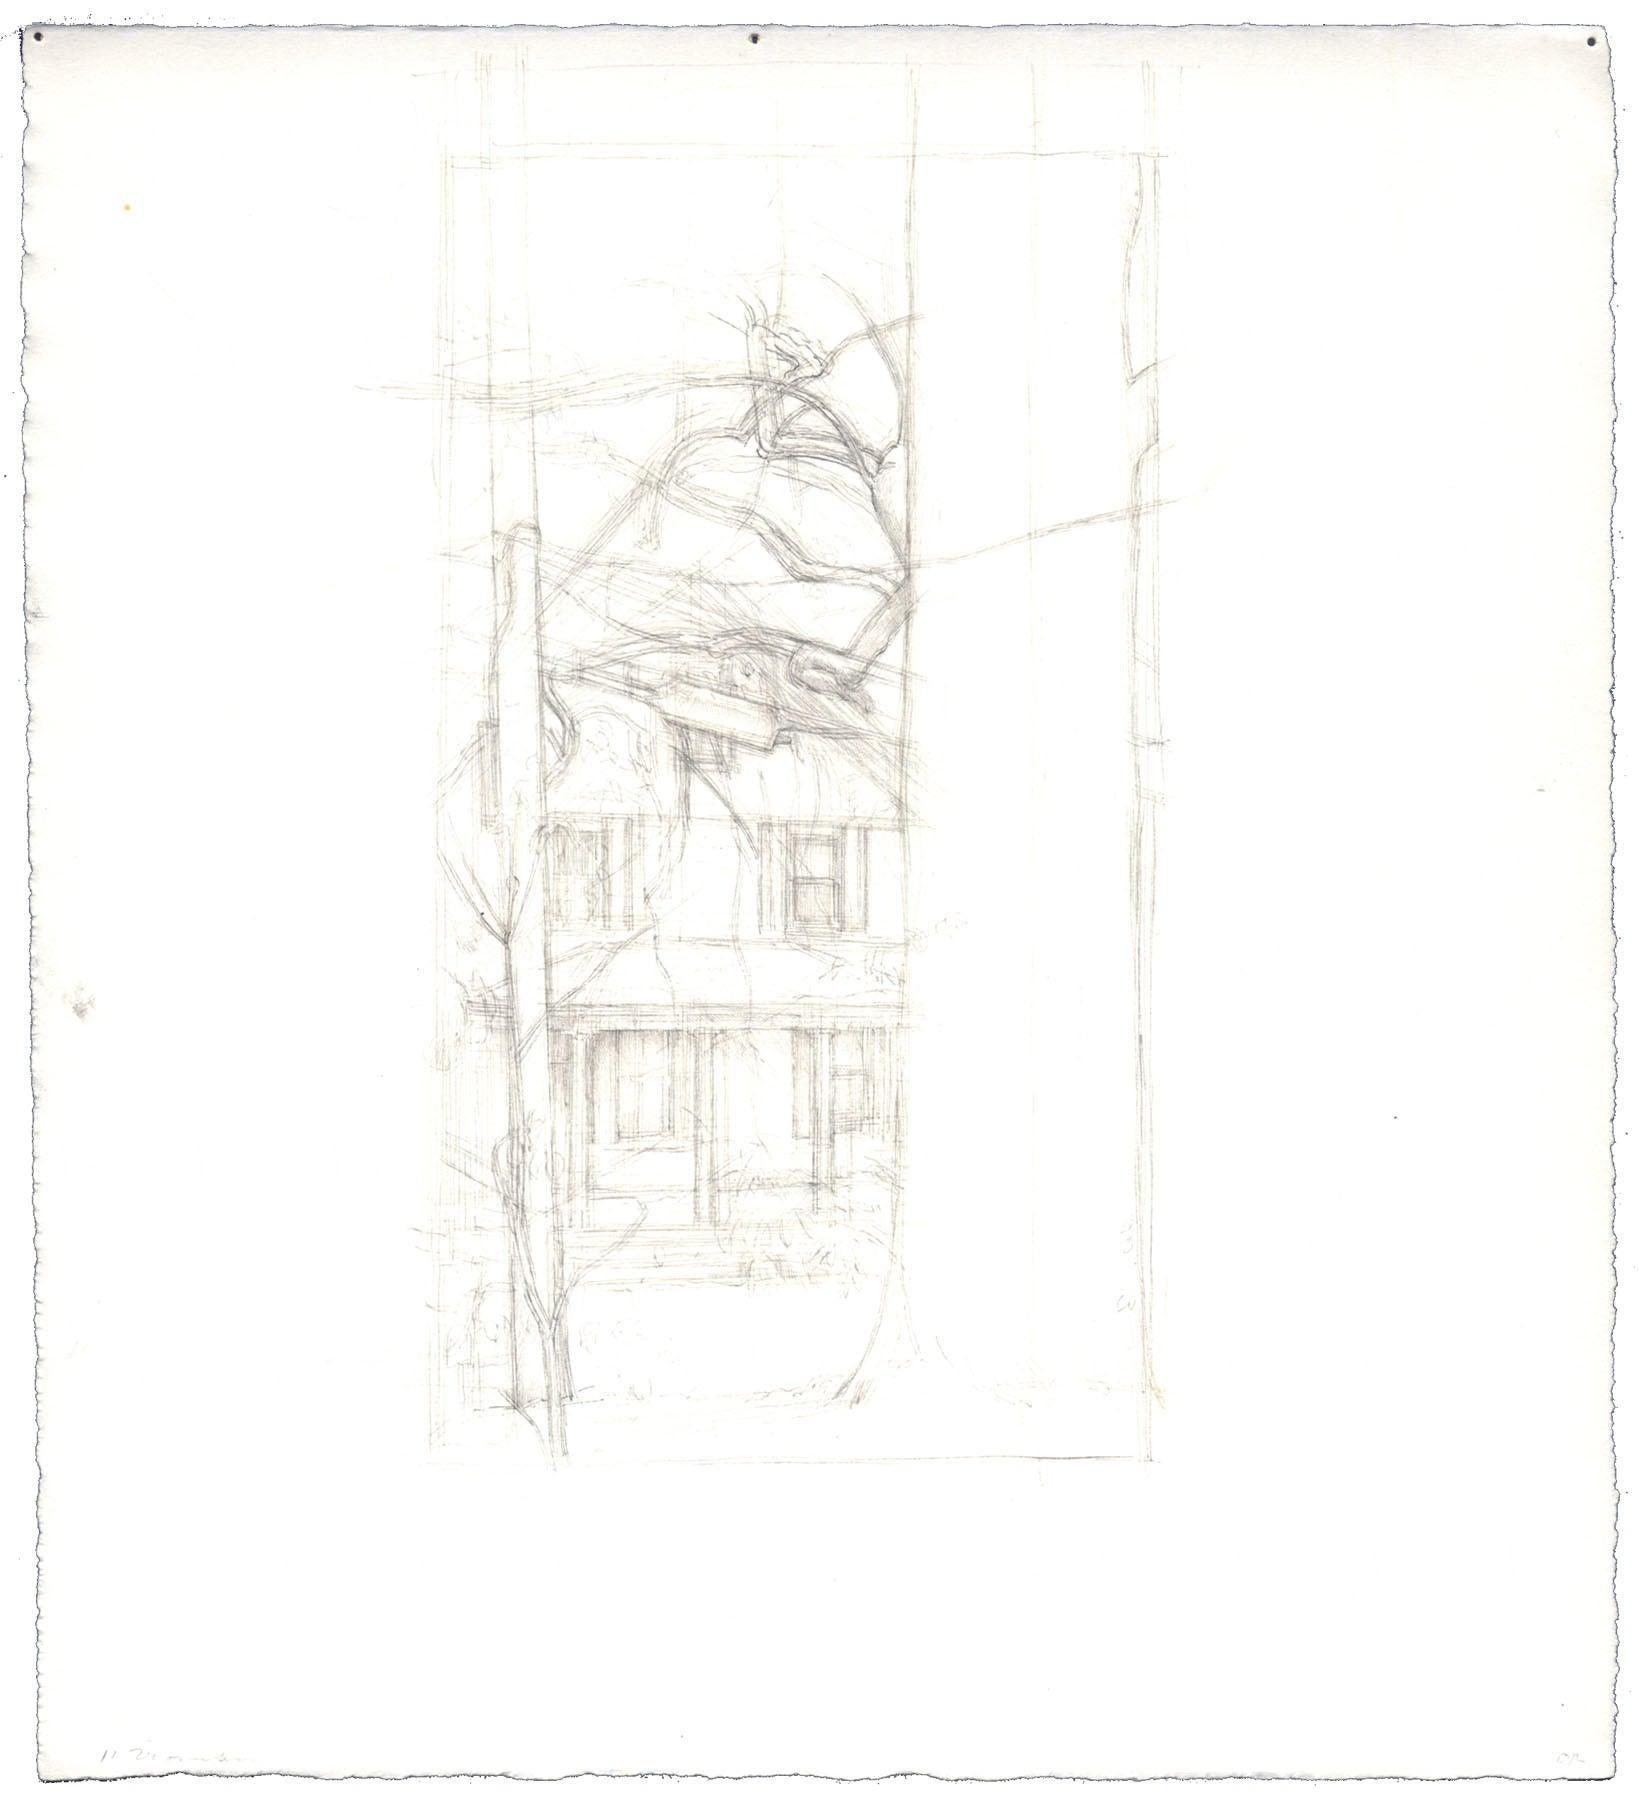 Study for Streetlight image